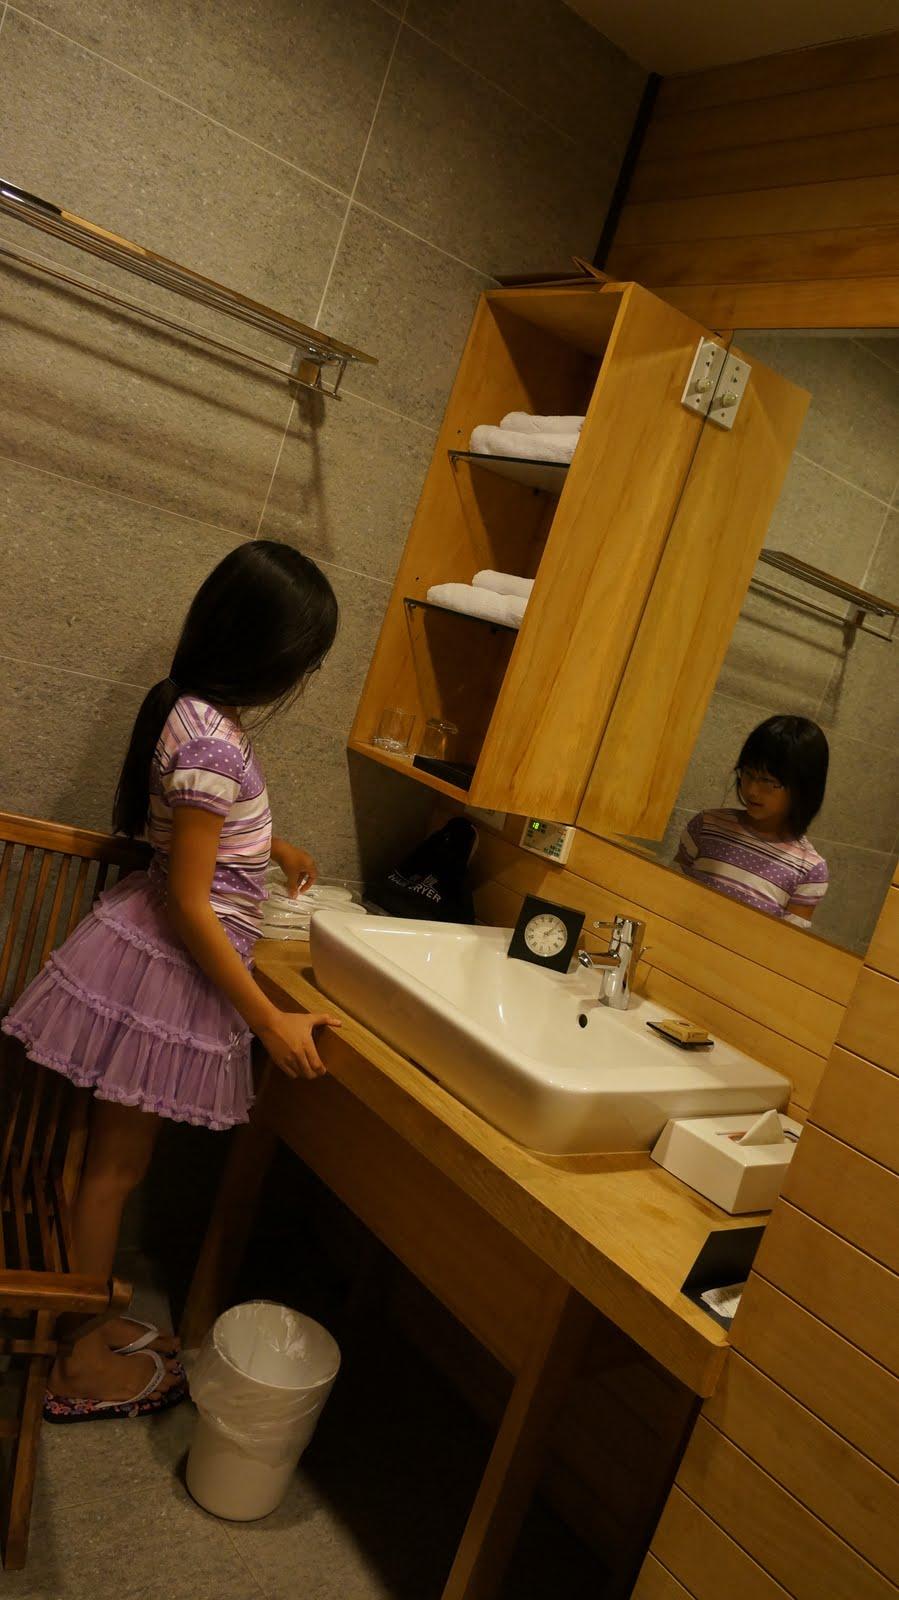 【JS】女子小学生 高学年画像スレPart3【JS】YouTube動画>6本 ->画像>751枚